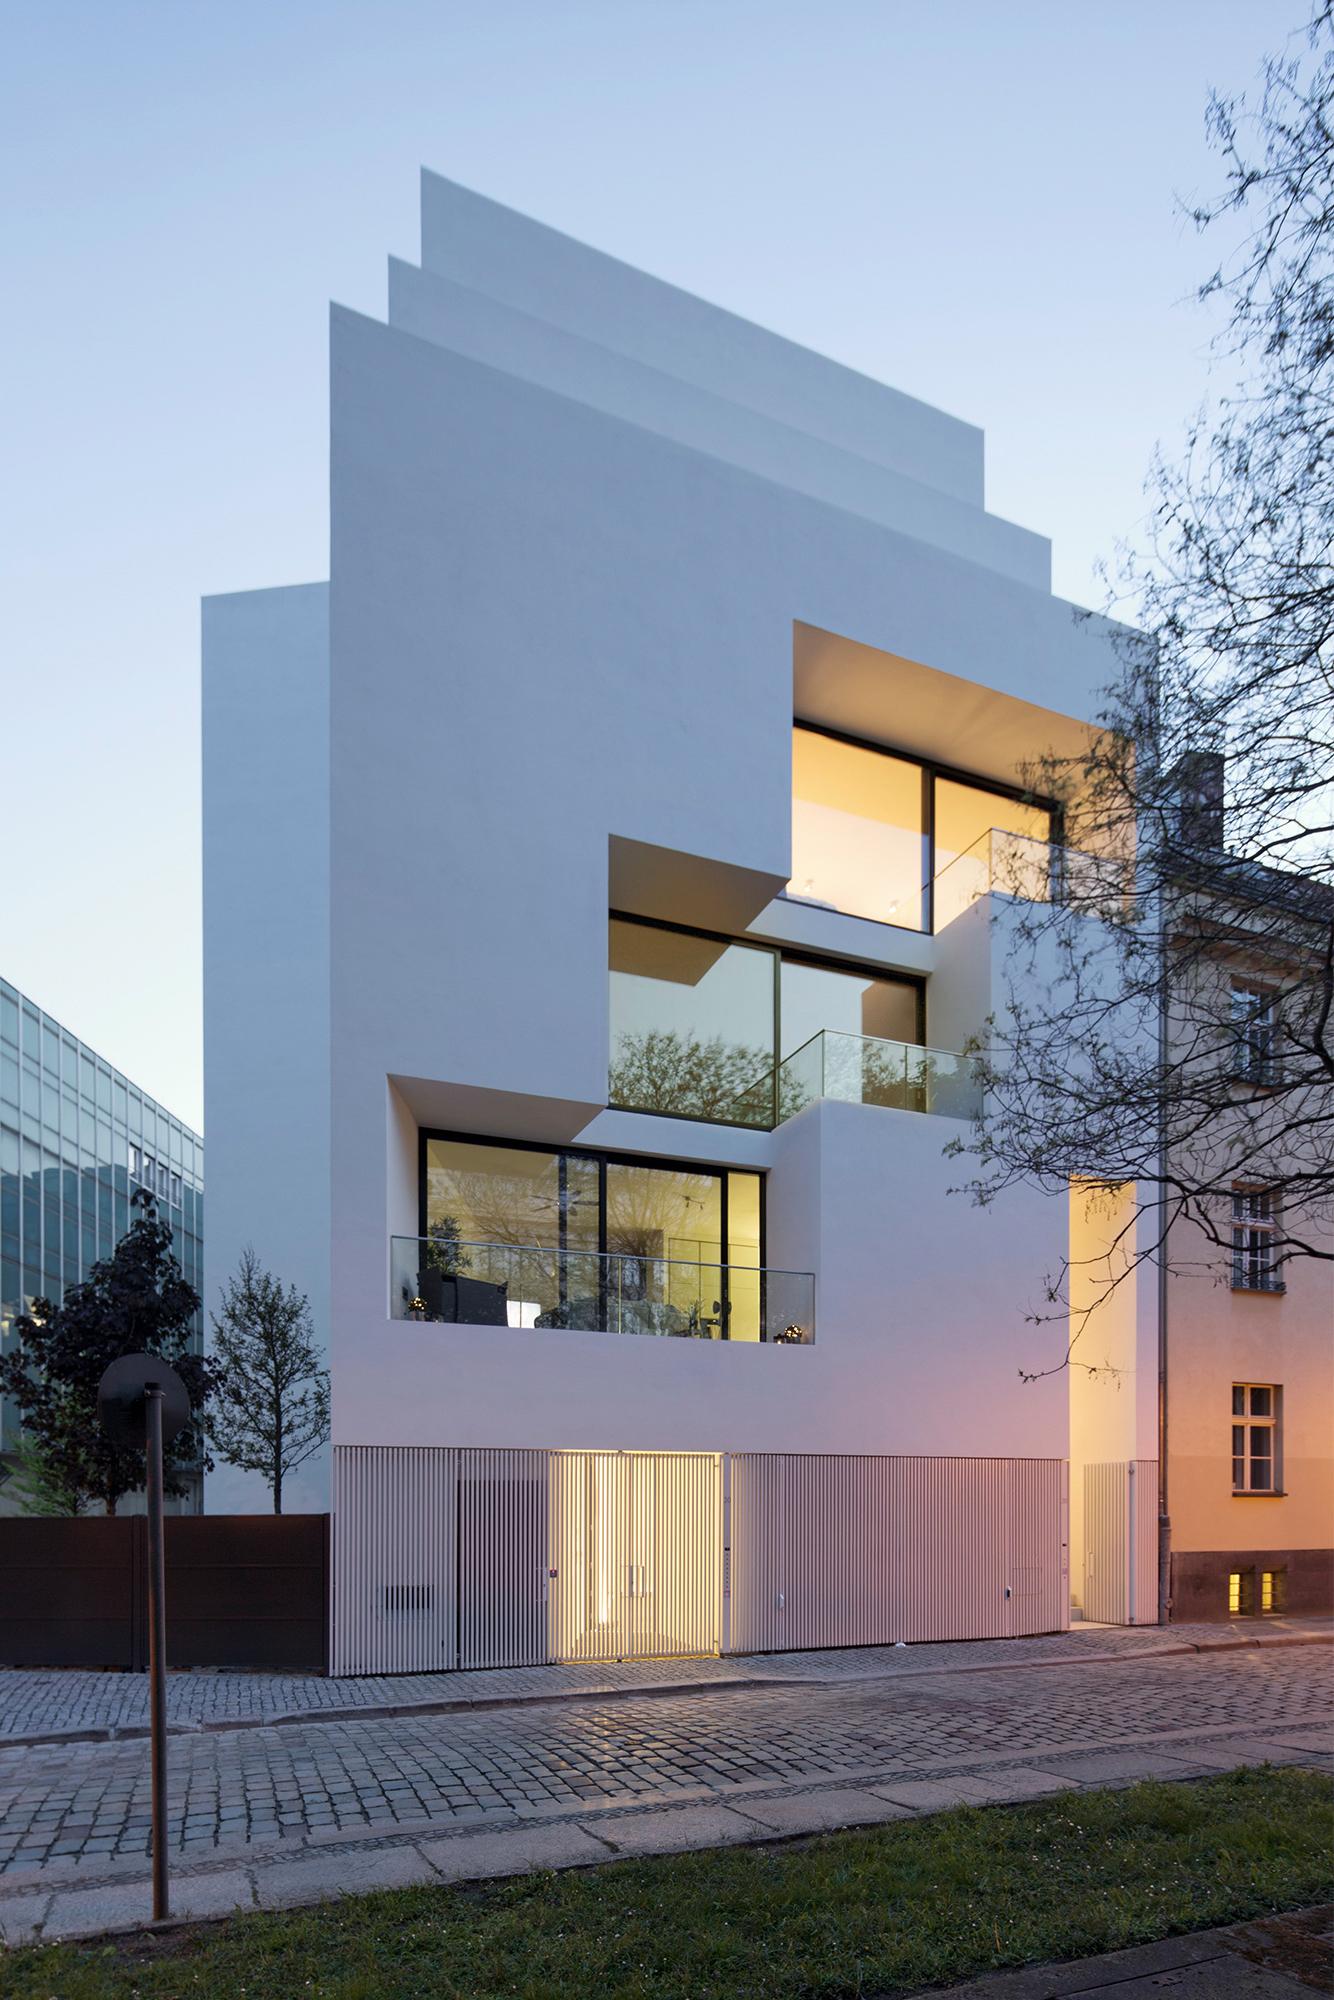 2800x2000_Housing_Berlin_23_2800-1